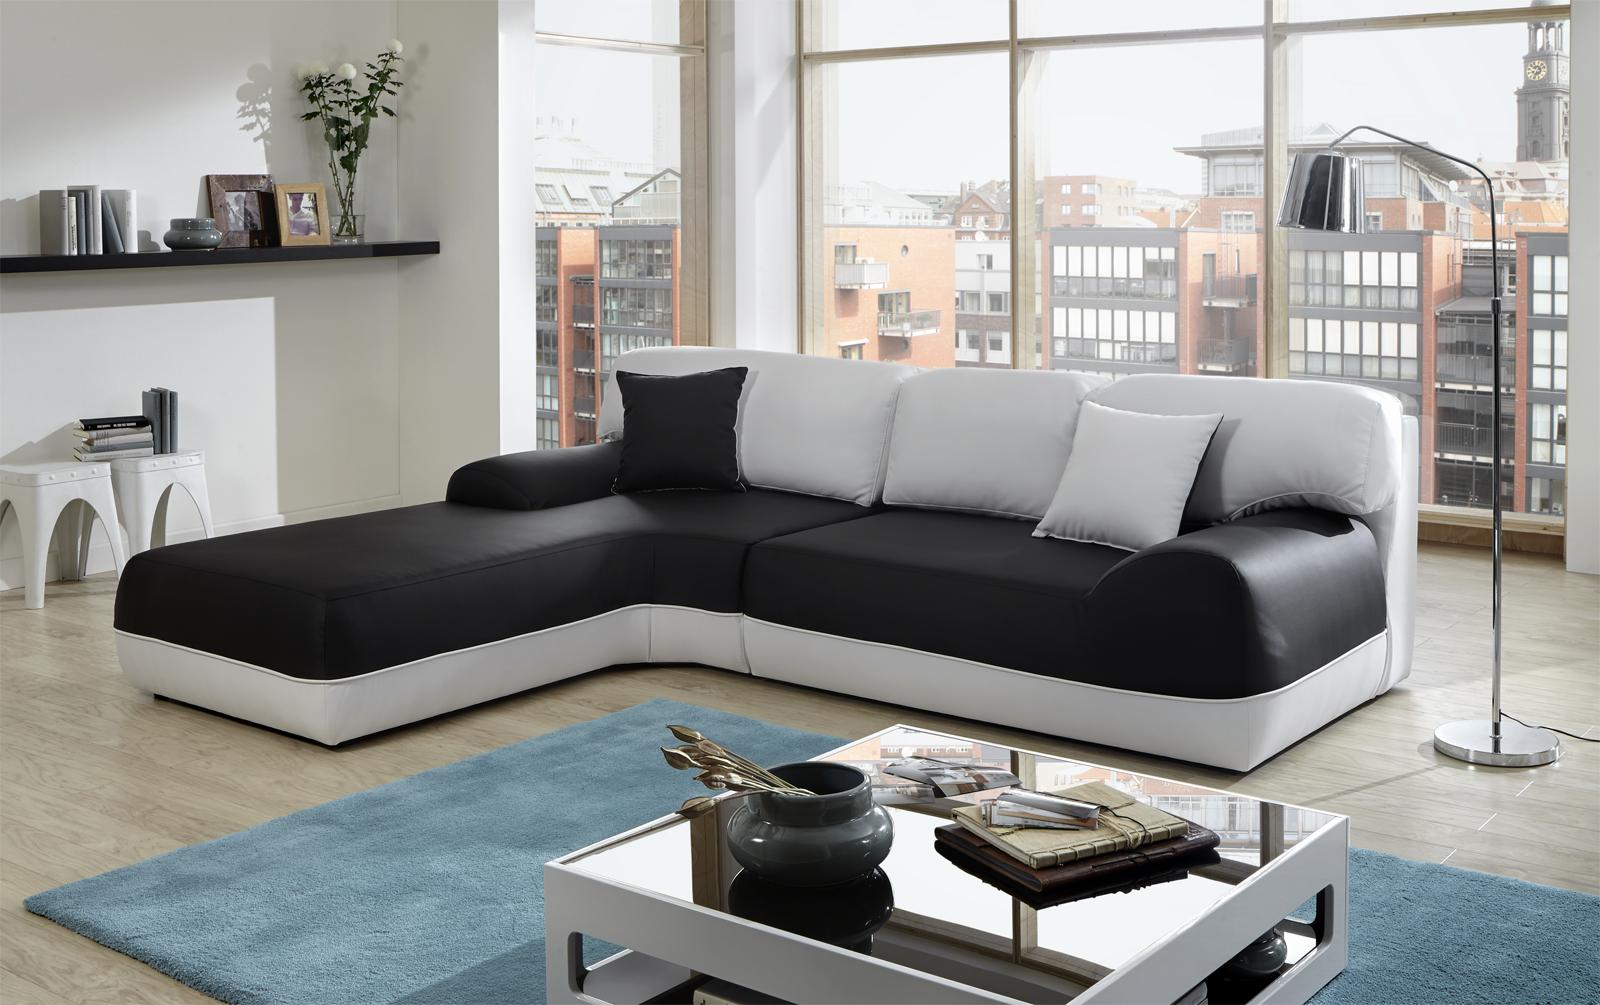 Sam ecksofa sofa schwarz wei couch impulso 220 x 260 cm for Wunderbar schwarz weis sofa